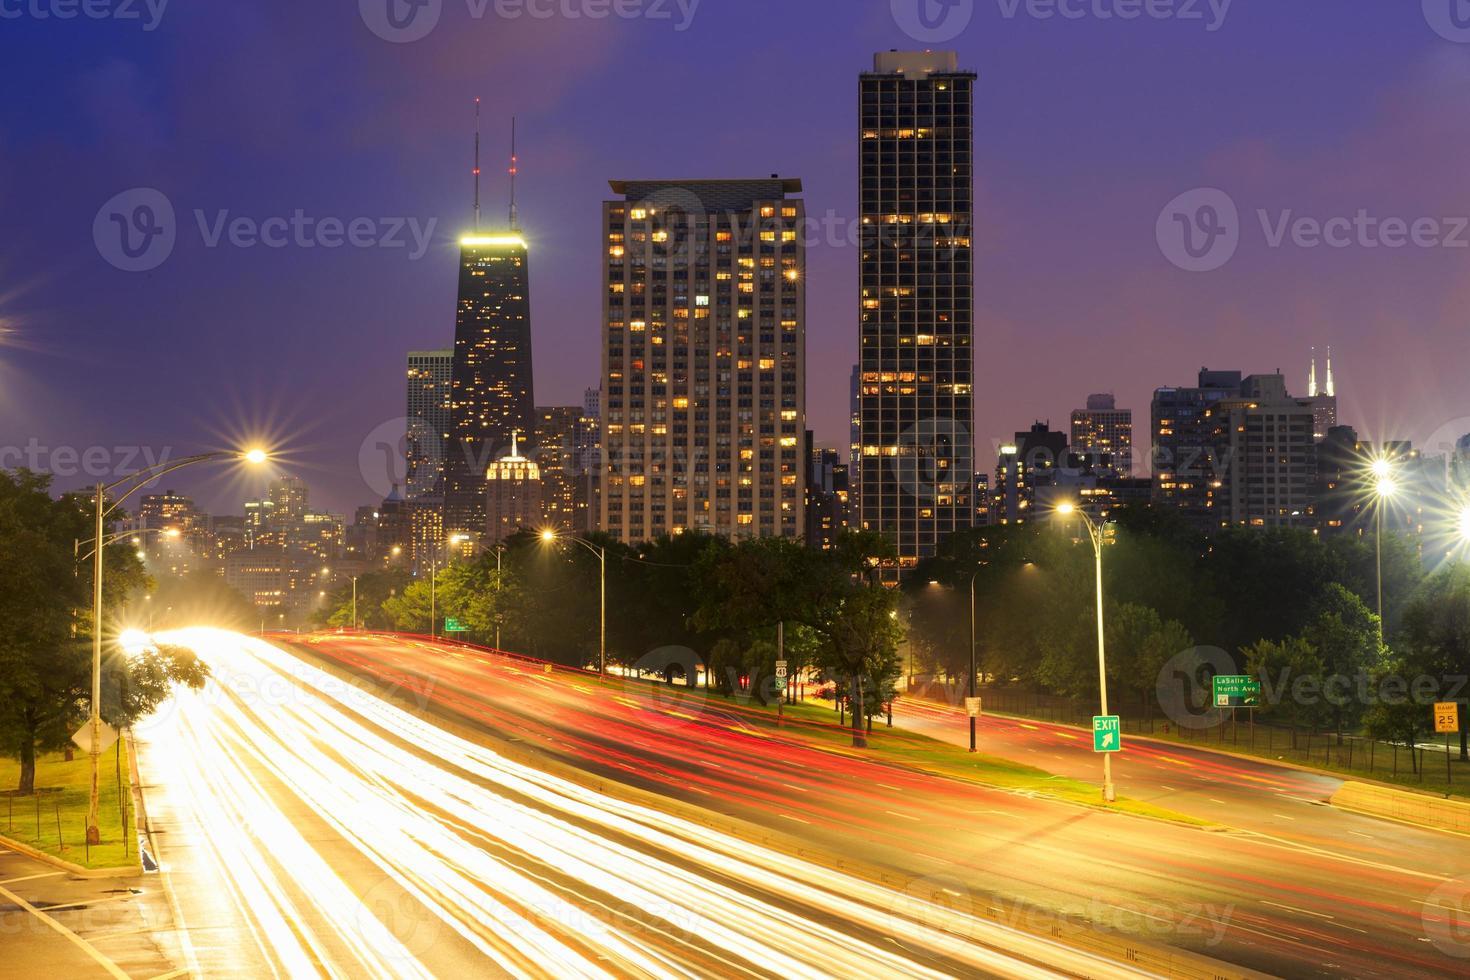 Chicago never sleeps photo